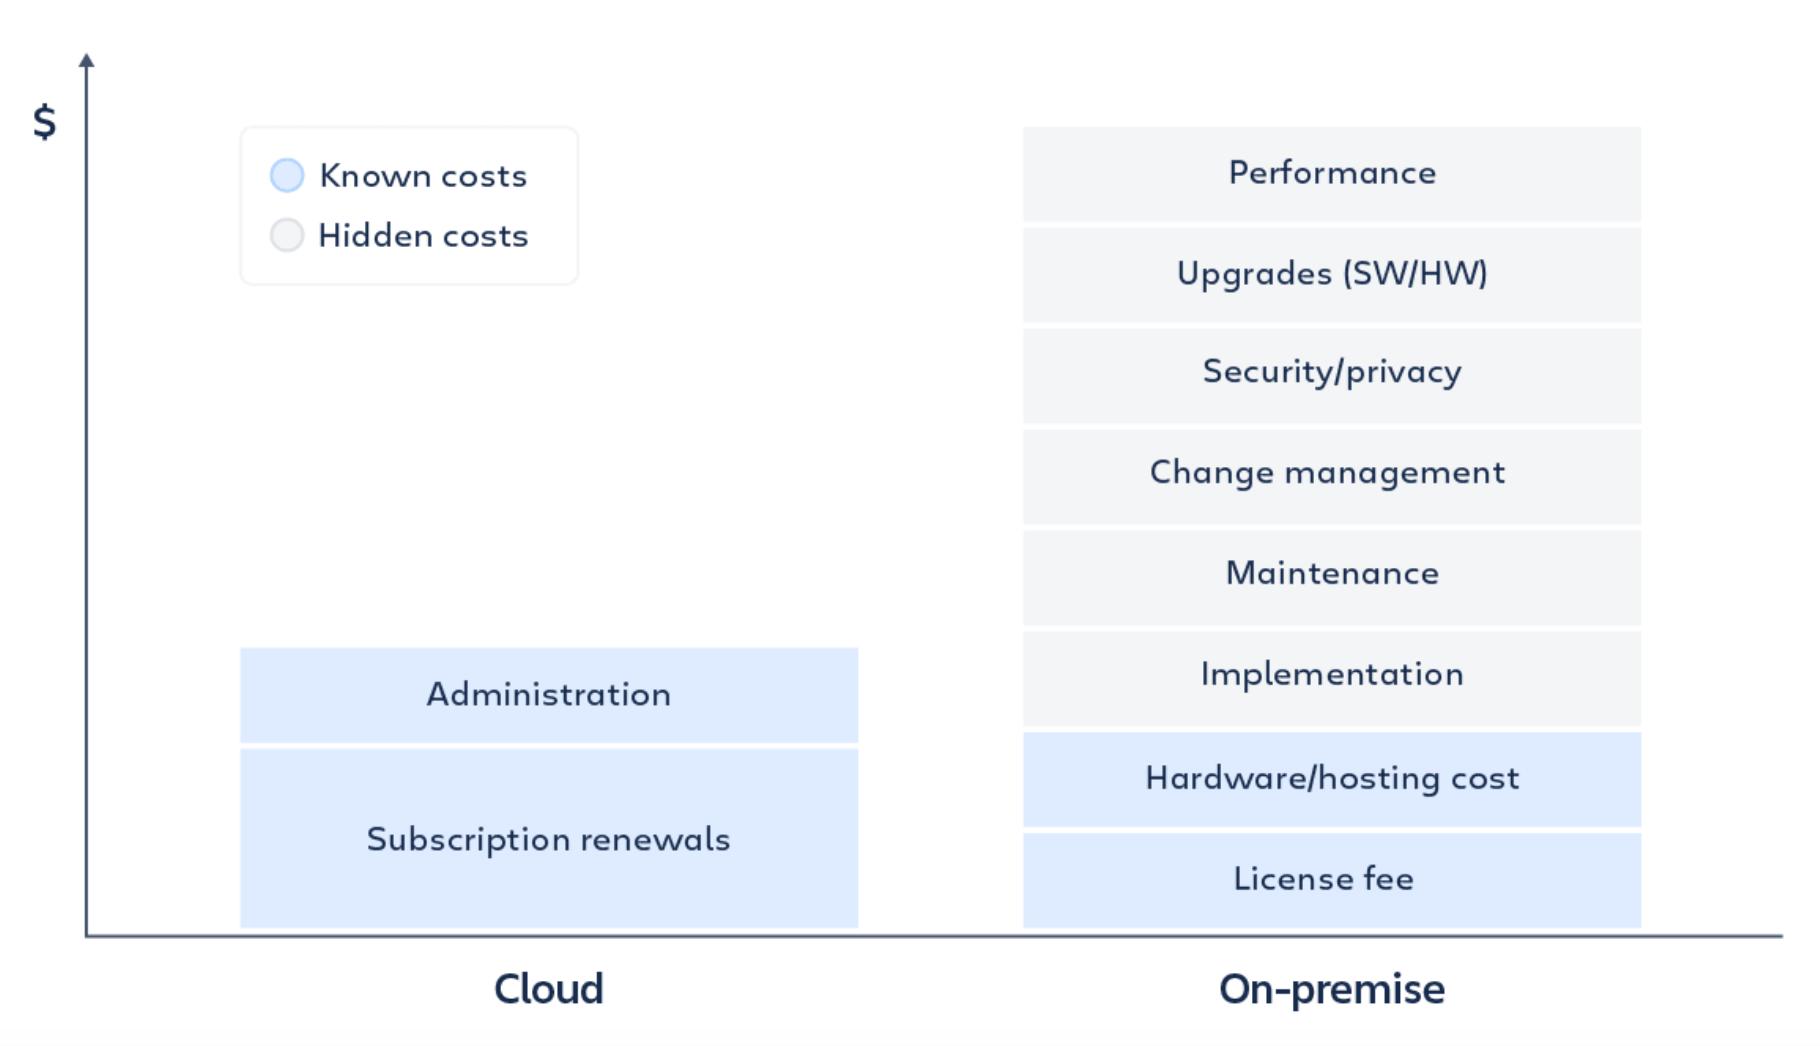 Atlassian Cloud versus On-Premise - offene und versteckte Kosten